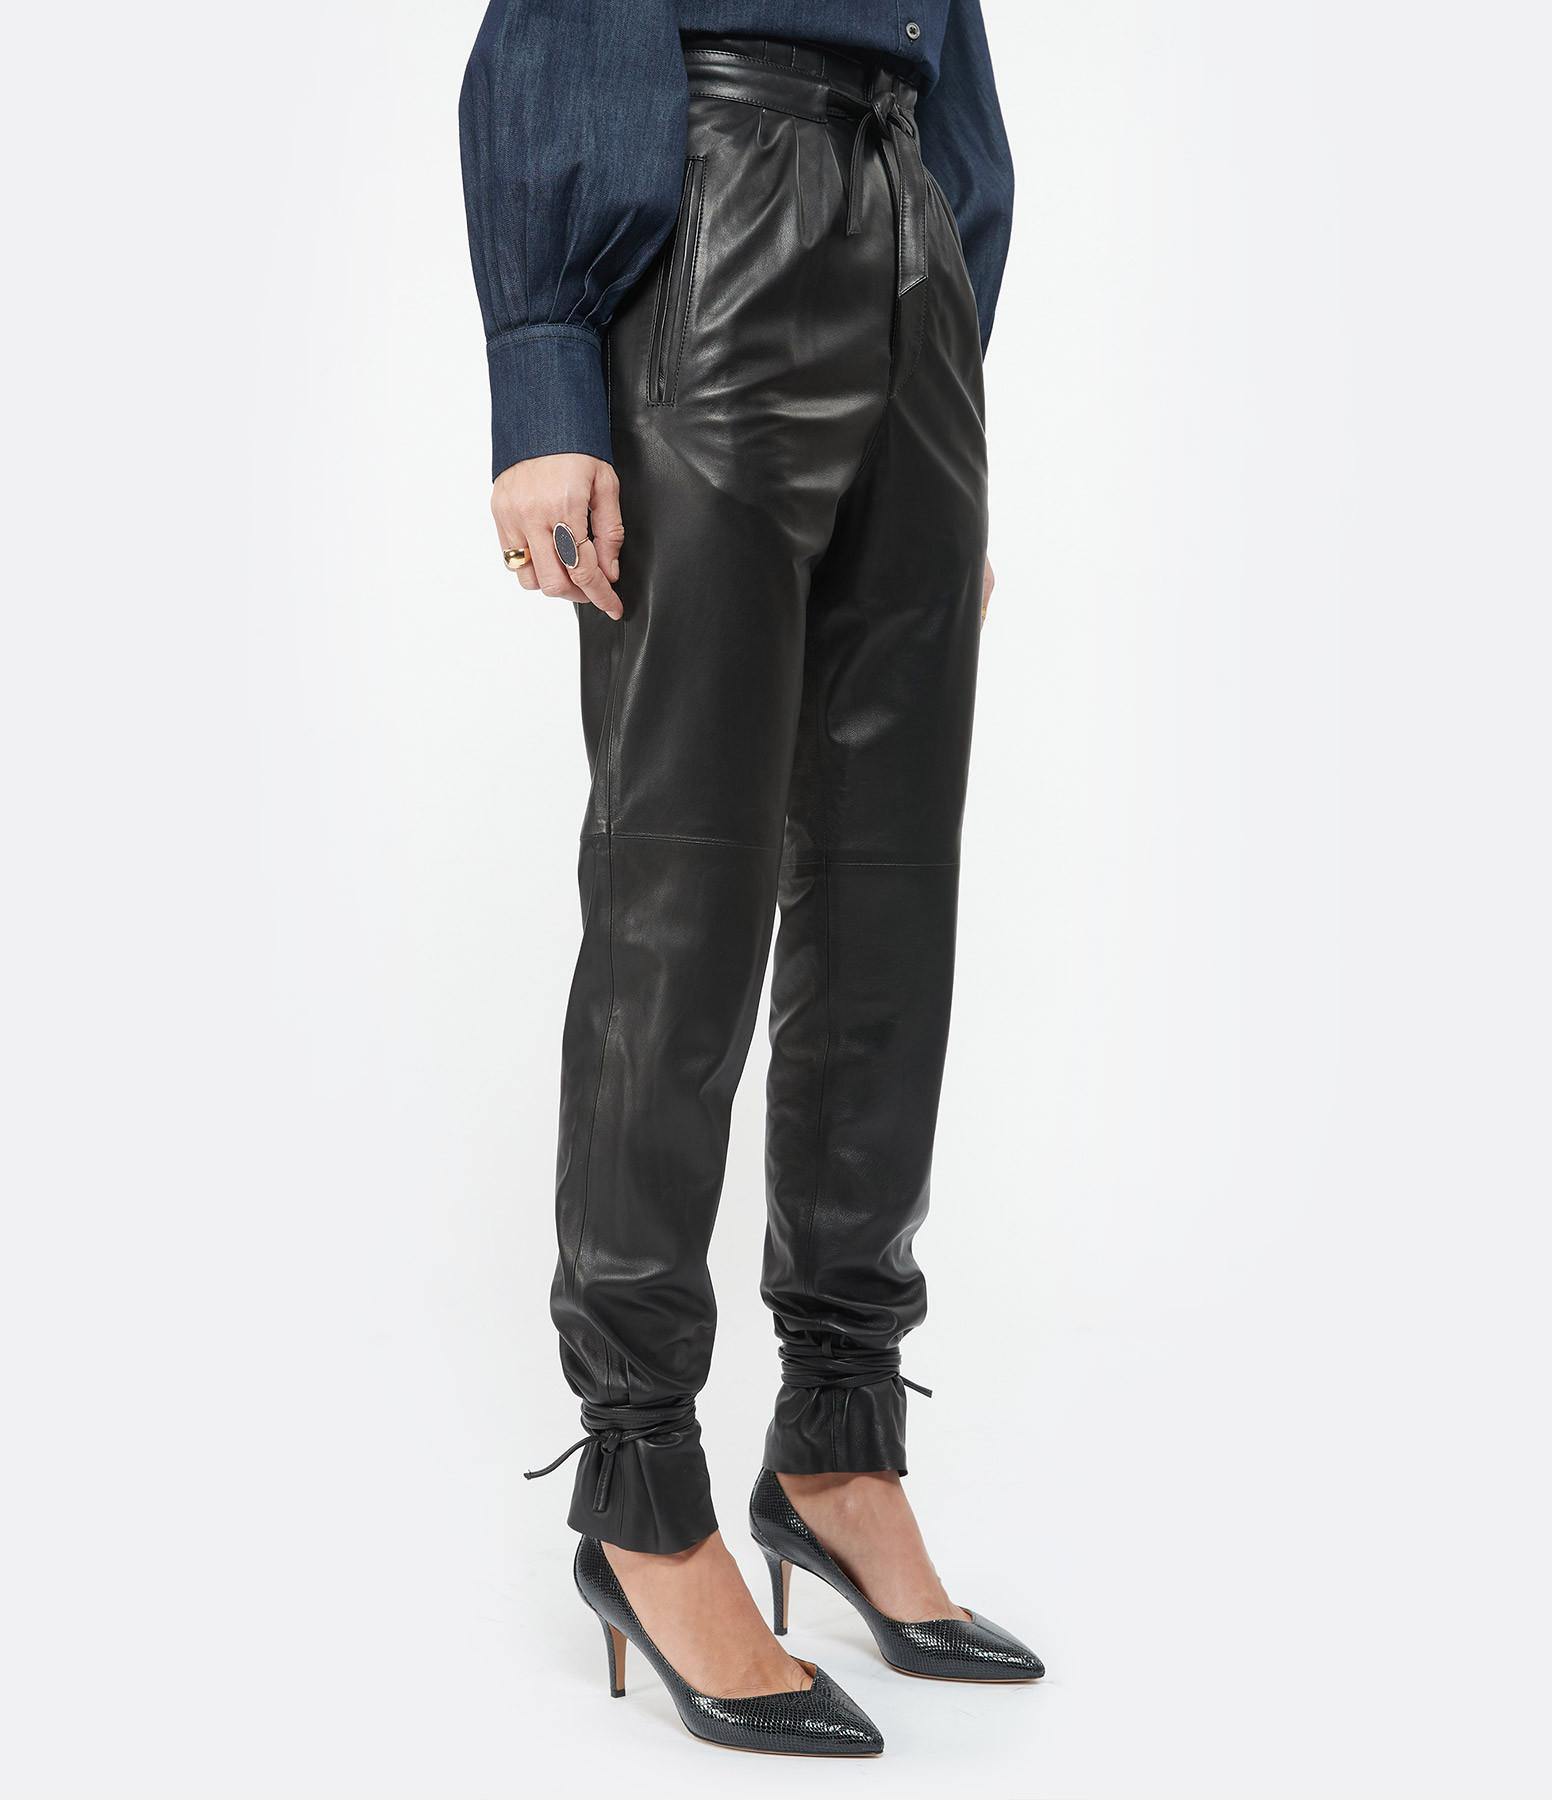 ISABEL MARANT - Pantalon Duardo Cuir Noir